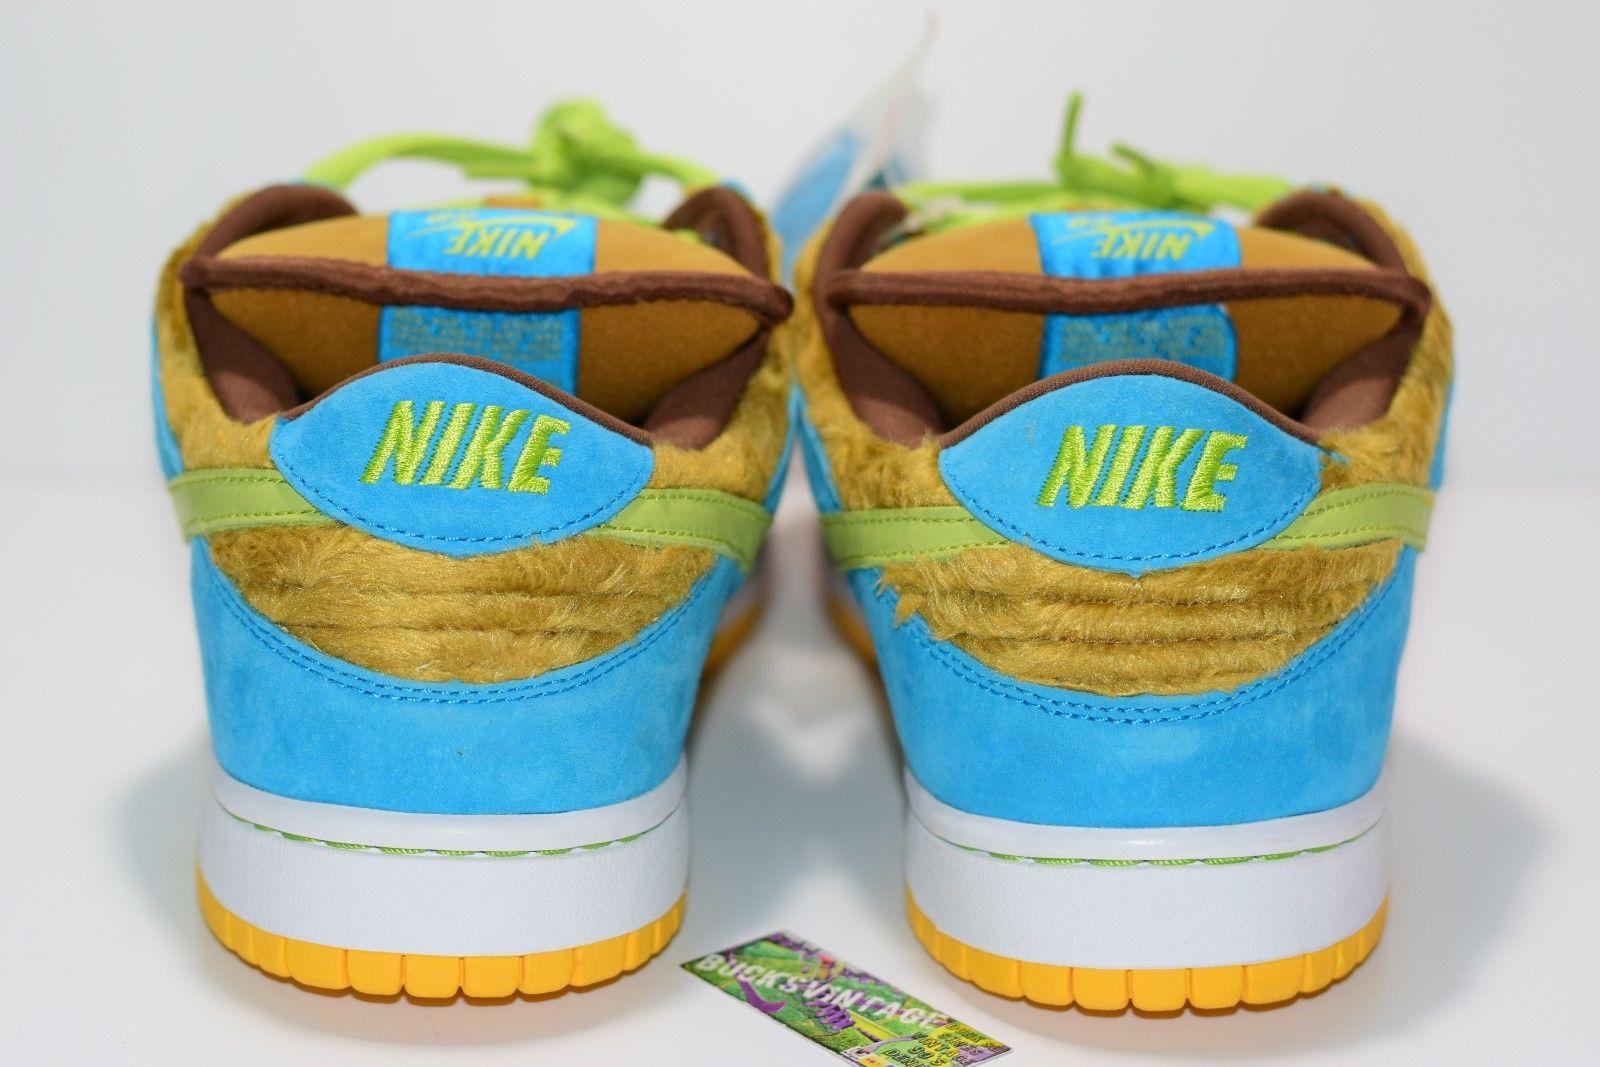 factory price 340af 78dd3 ... Size 11  DS 2006 Nike Dunk Sb BABY BEAR 313170 731 light  umbergrasshopper